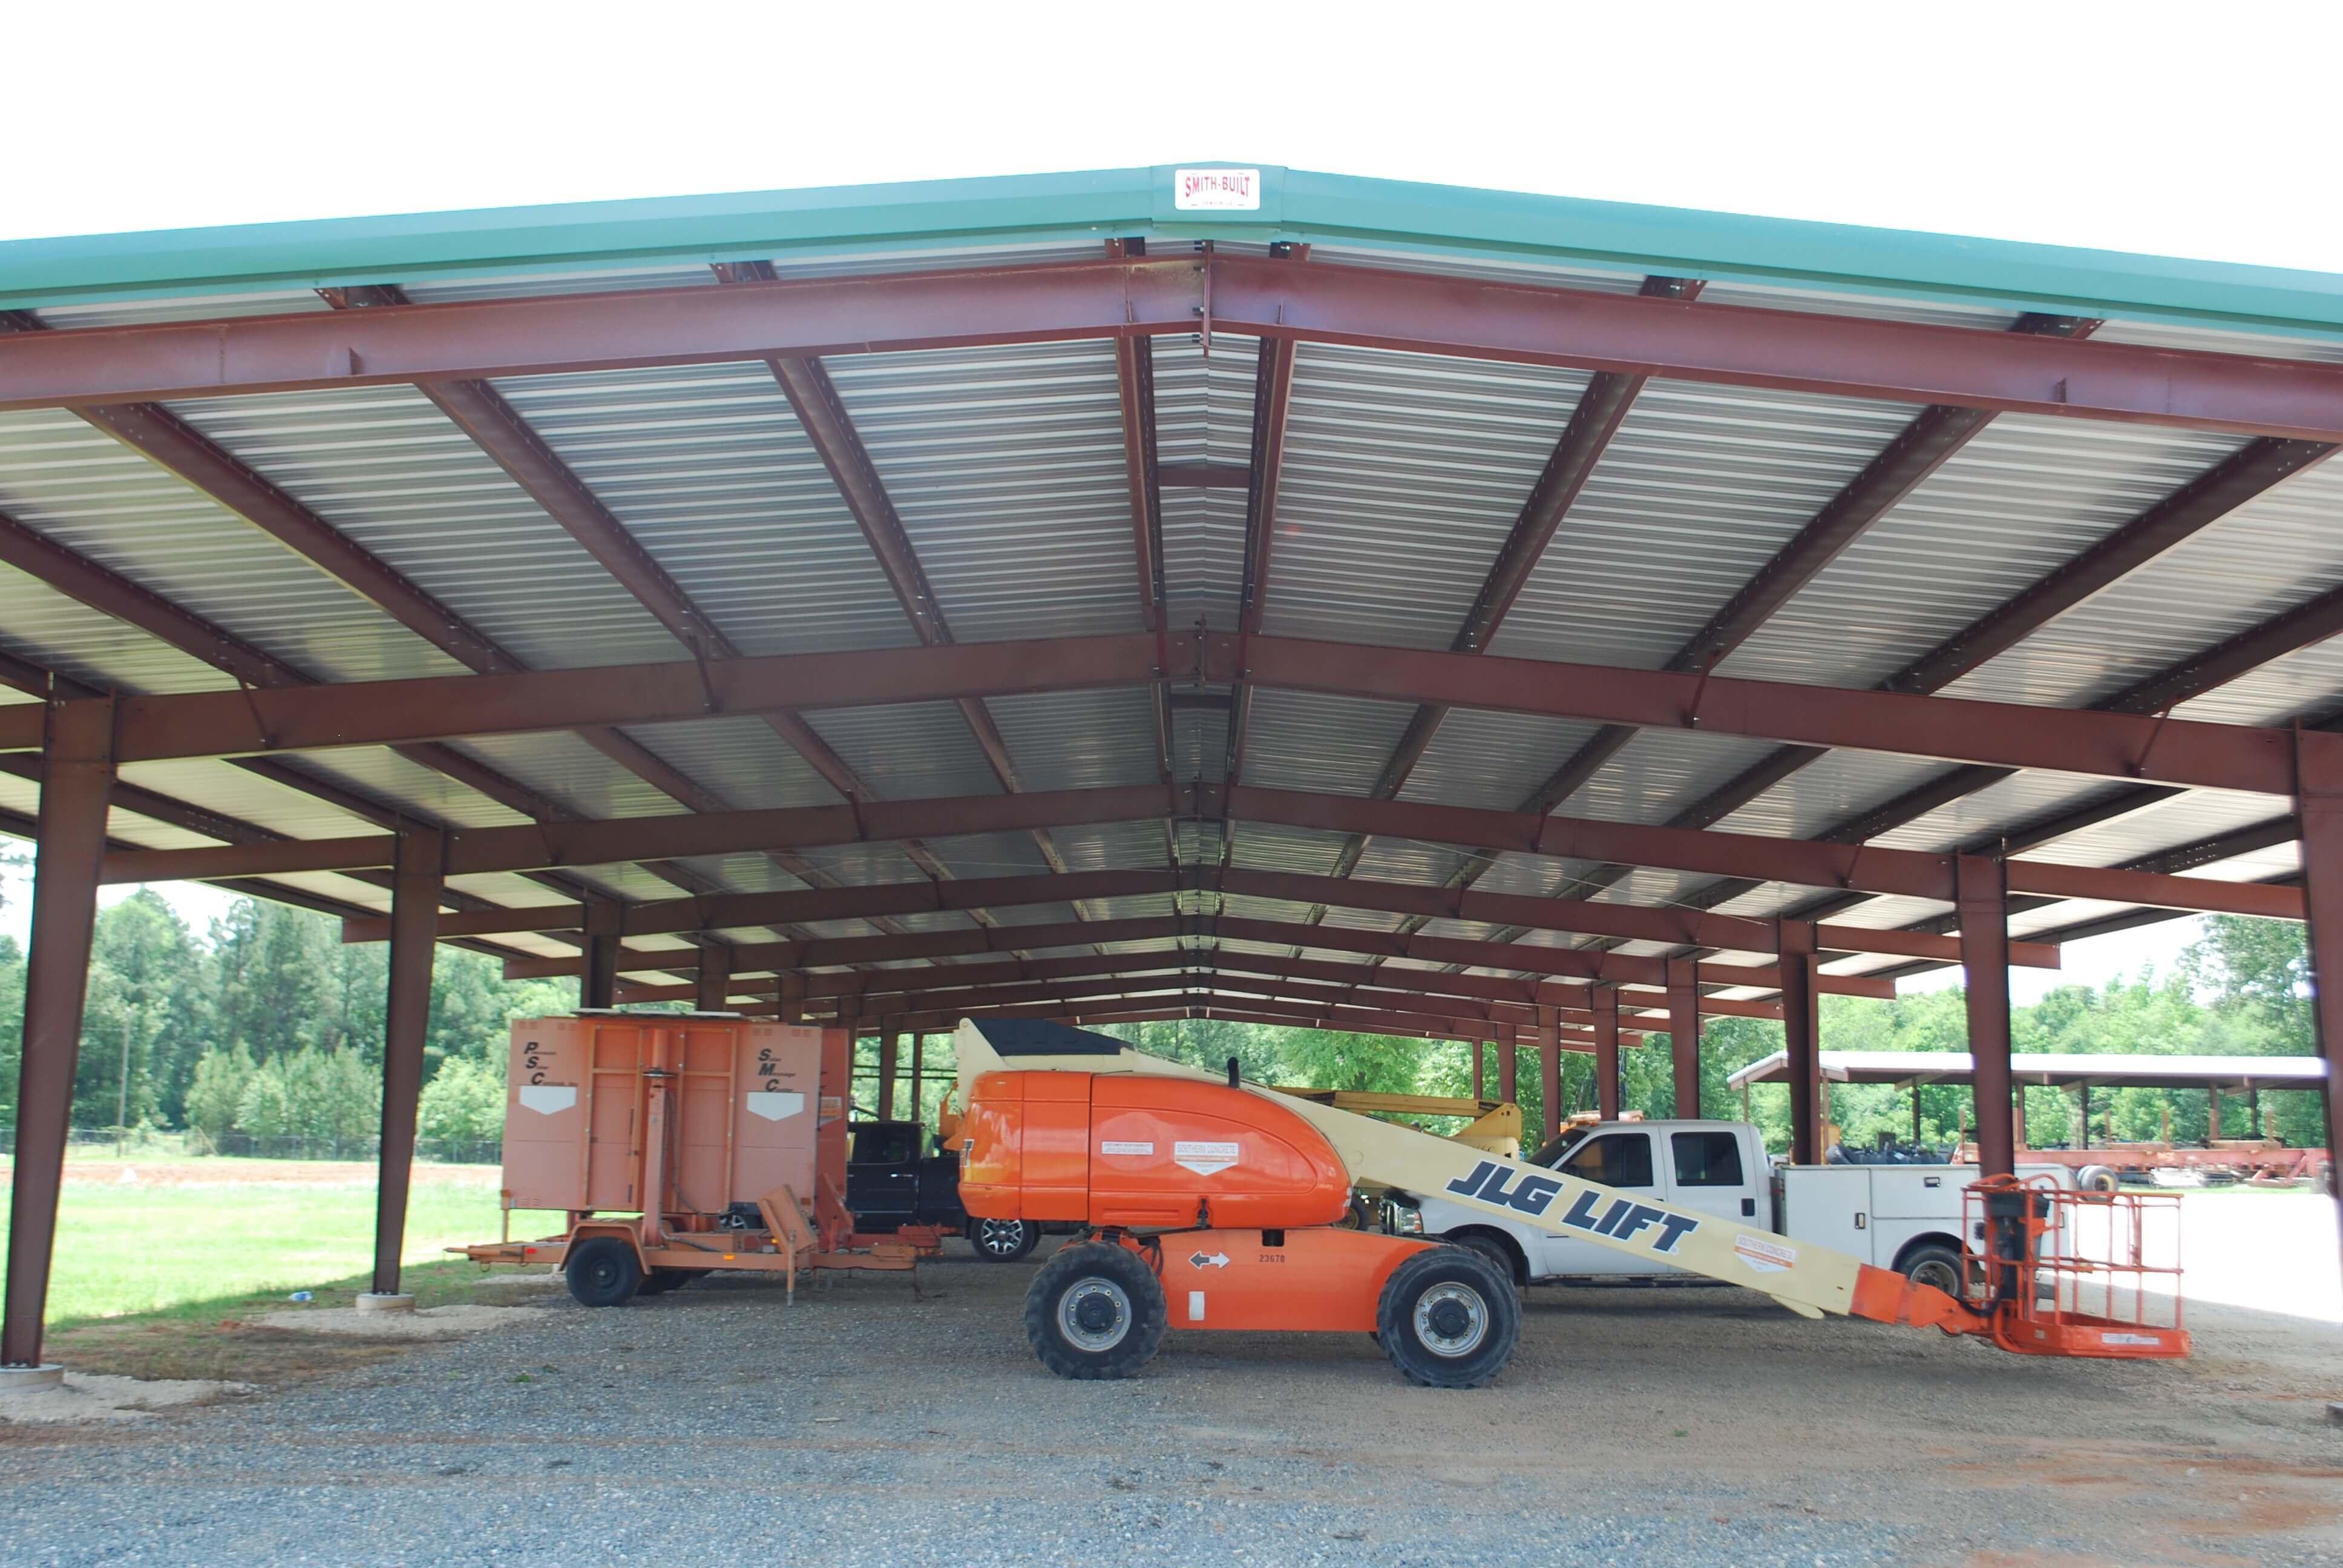 Tractor sheds for sale - Steel Buildings Steel Buildings